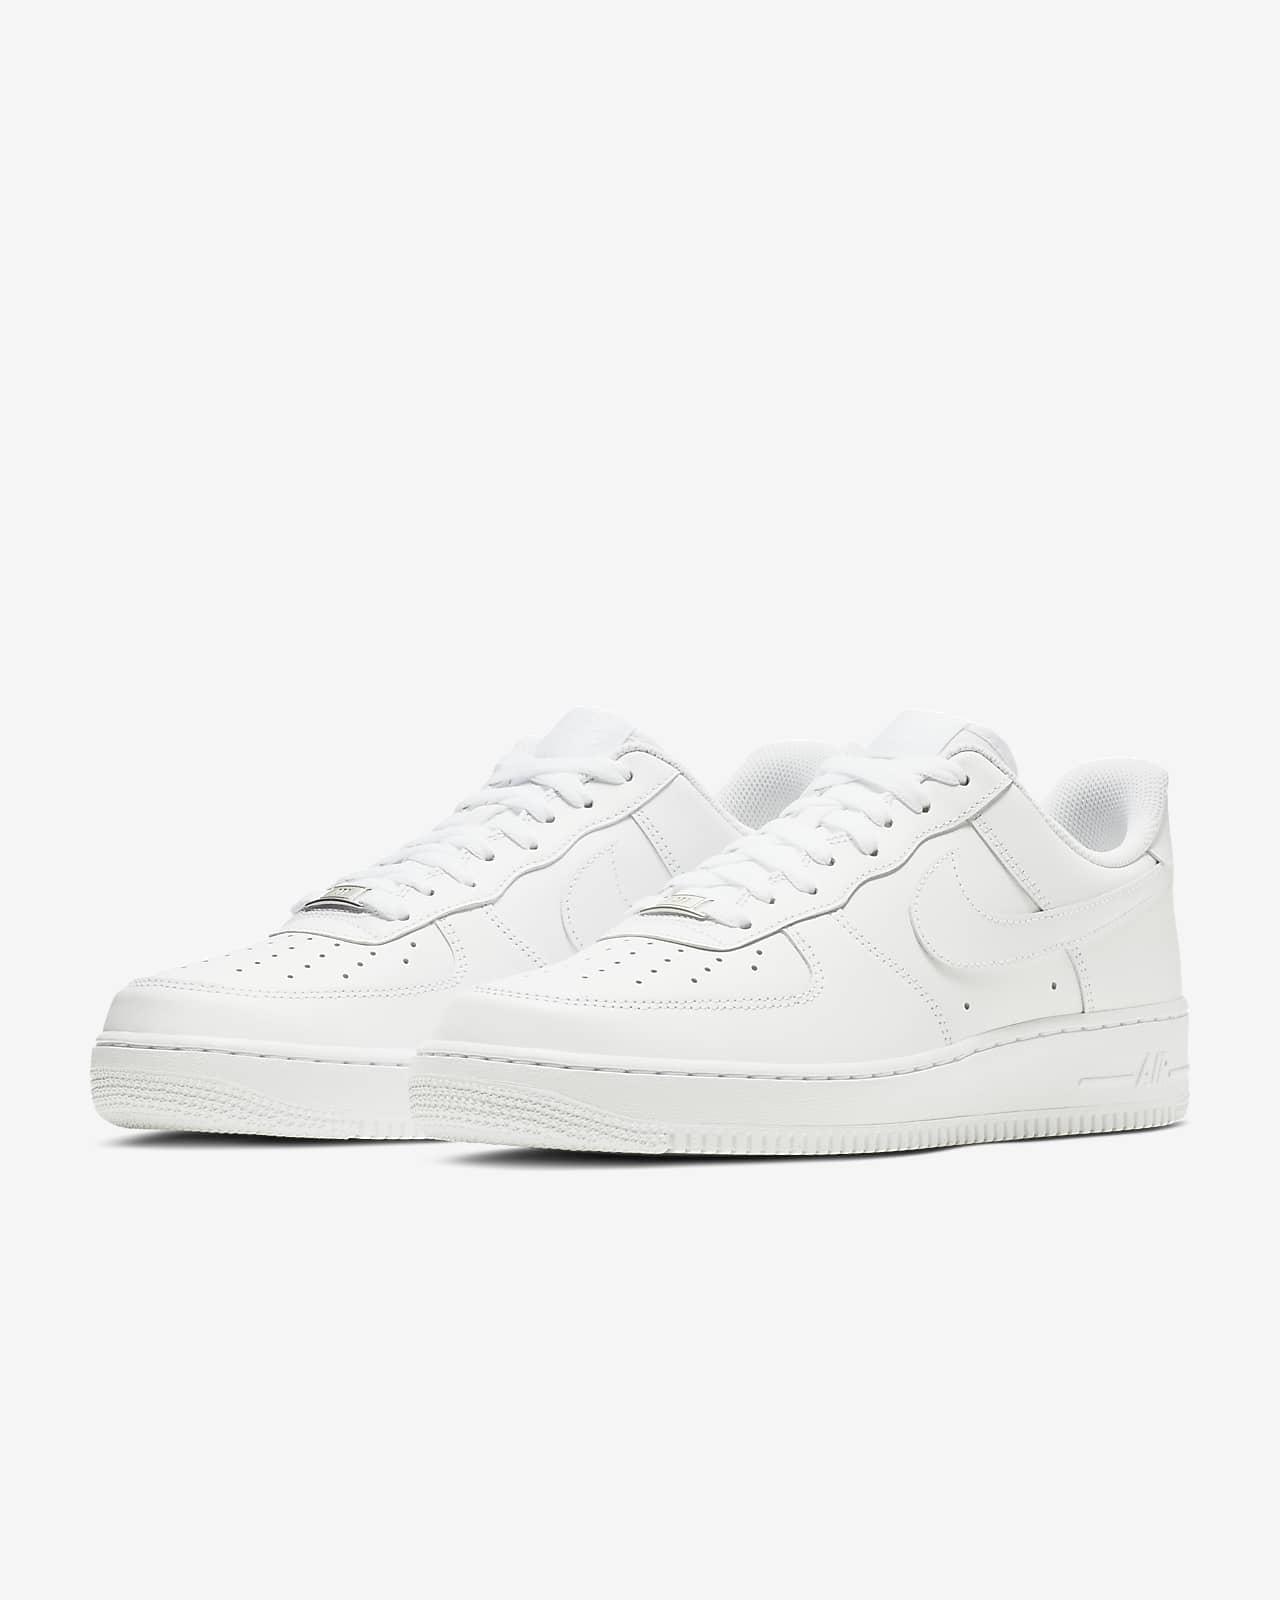 oído espíritu para agregar  Nike Air Force 1 '07 Men's Shoe. Nike NZ